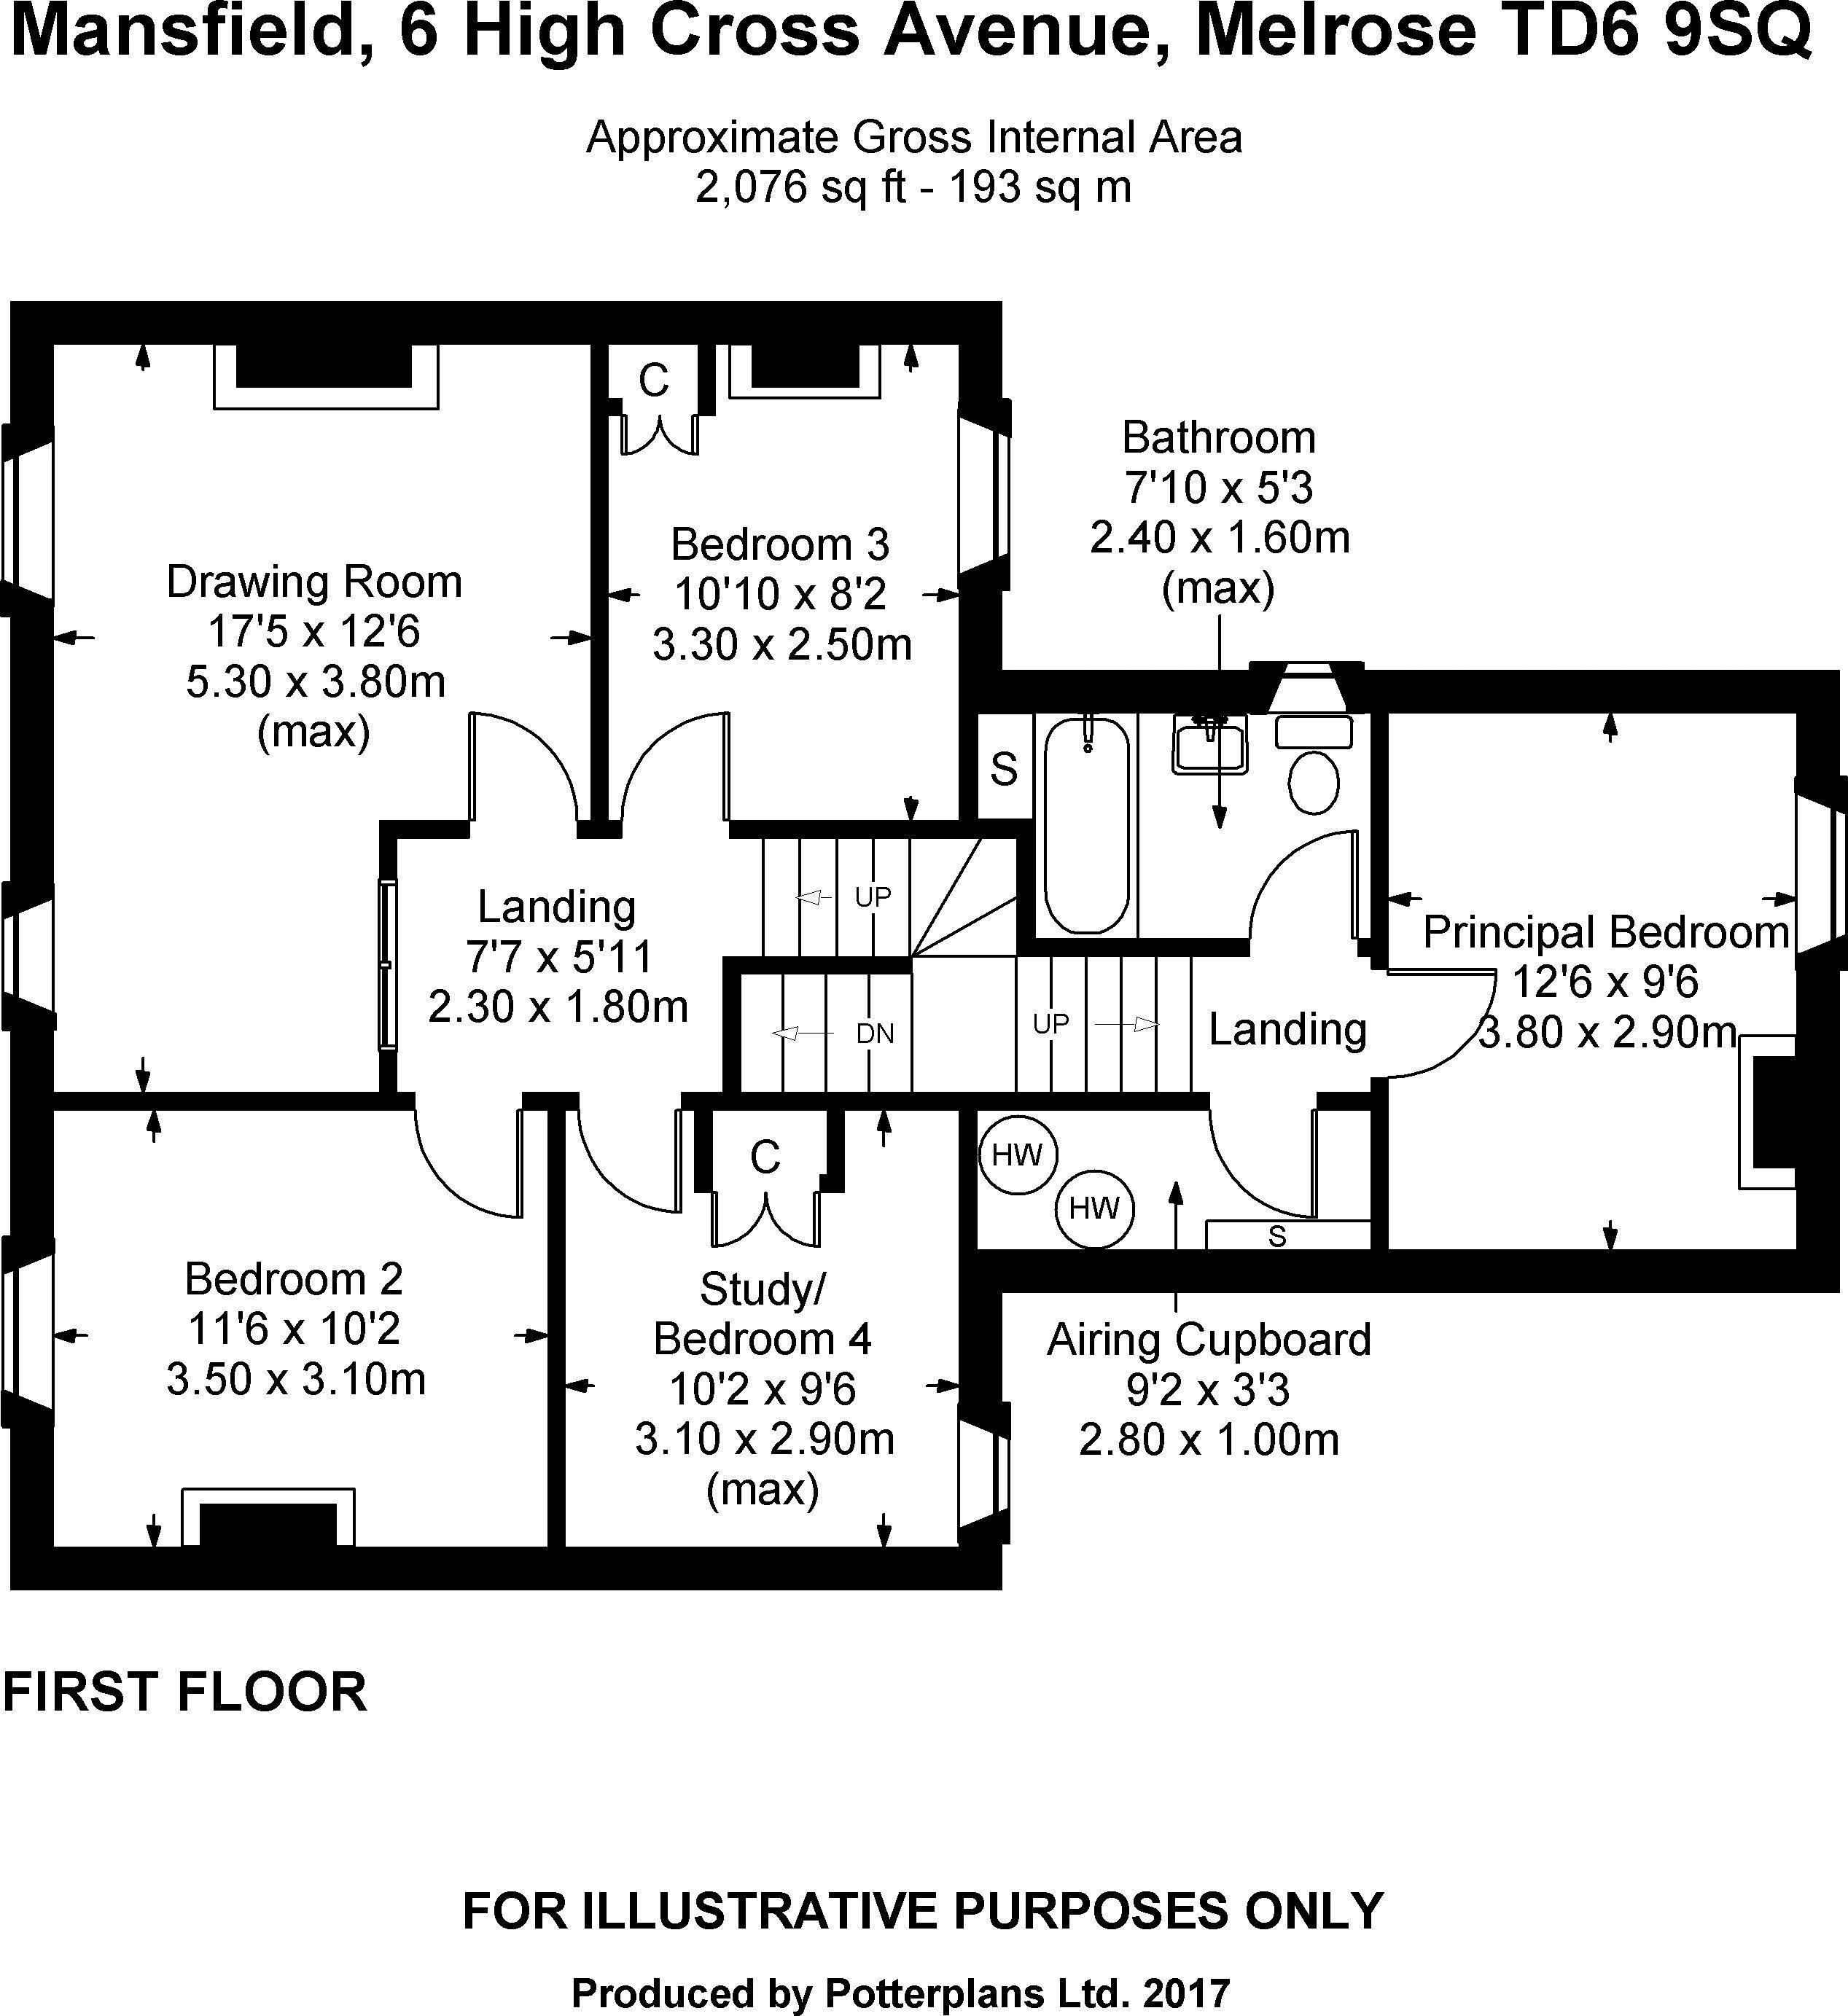 Mansfield First Floor